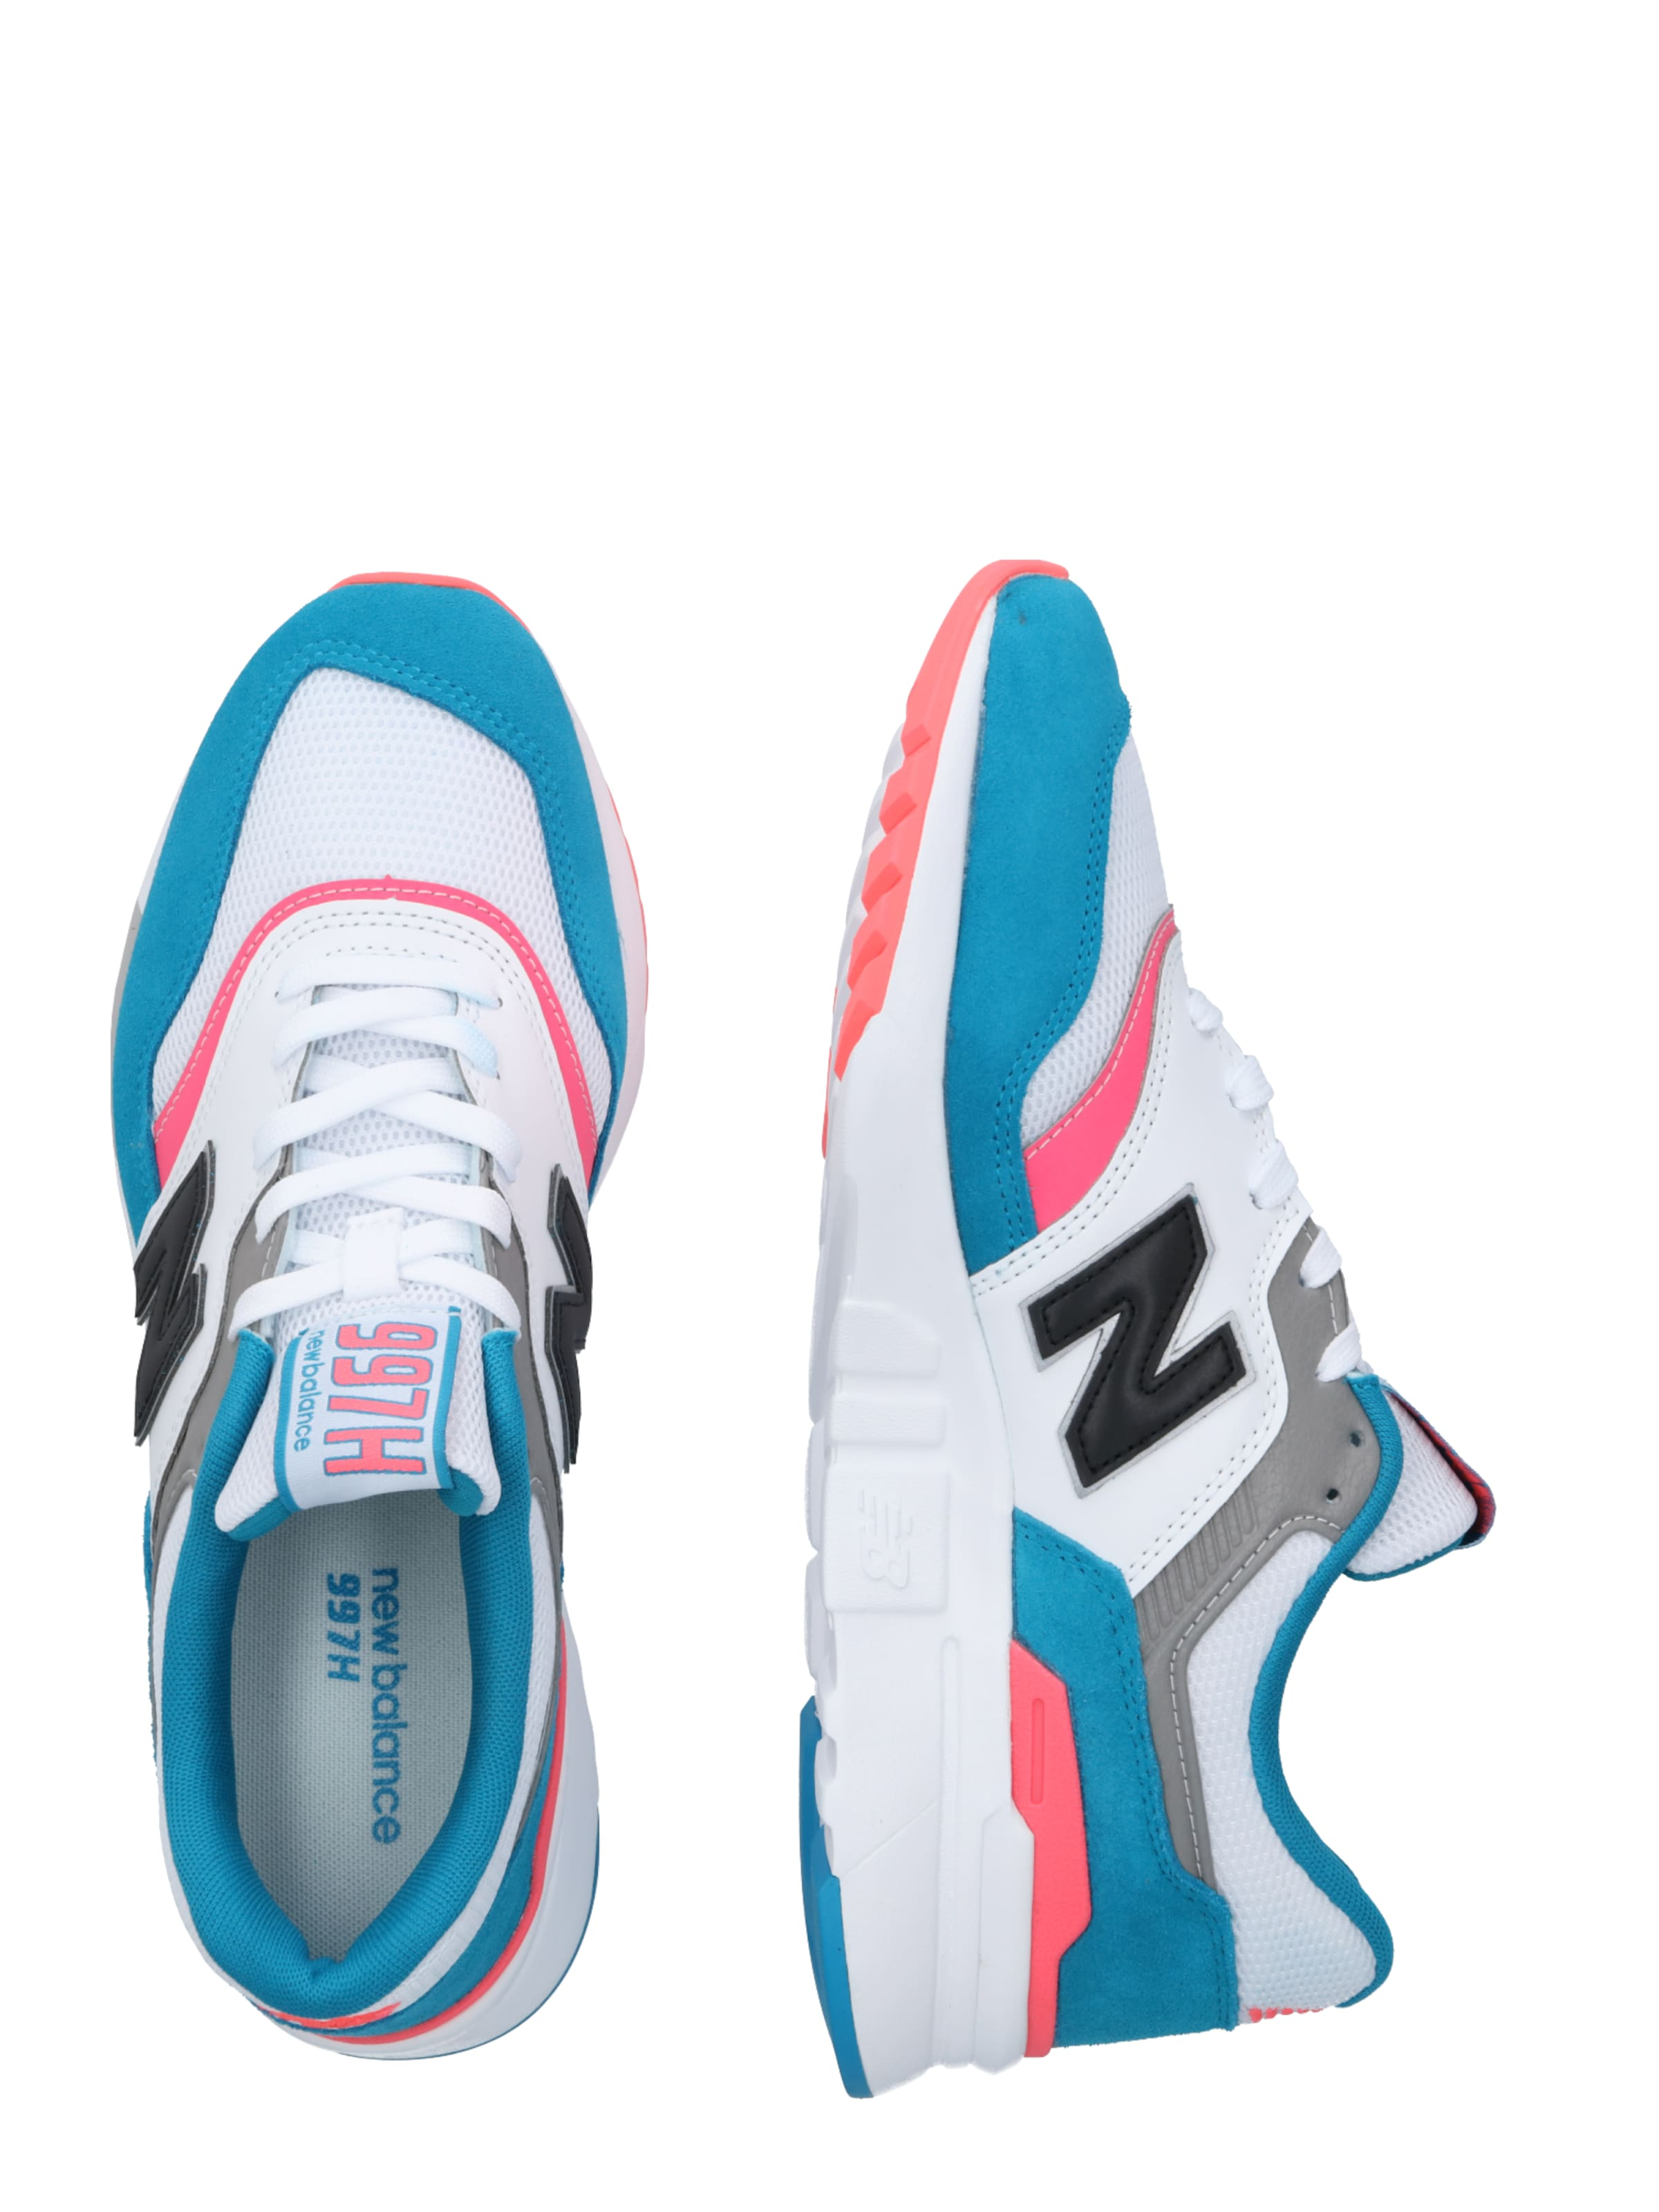 BlauRosa In Weiß New Balance Sneaker 'cm997 H' PZkiuOX